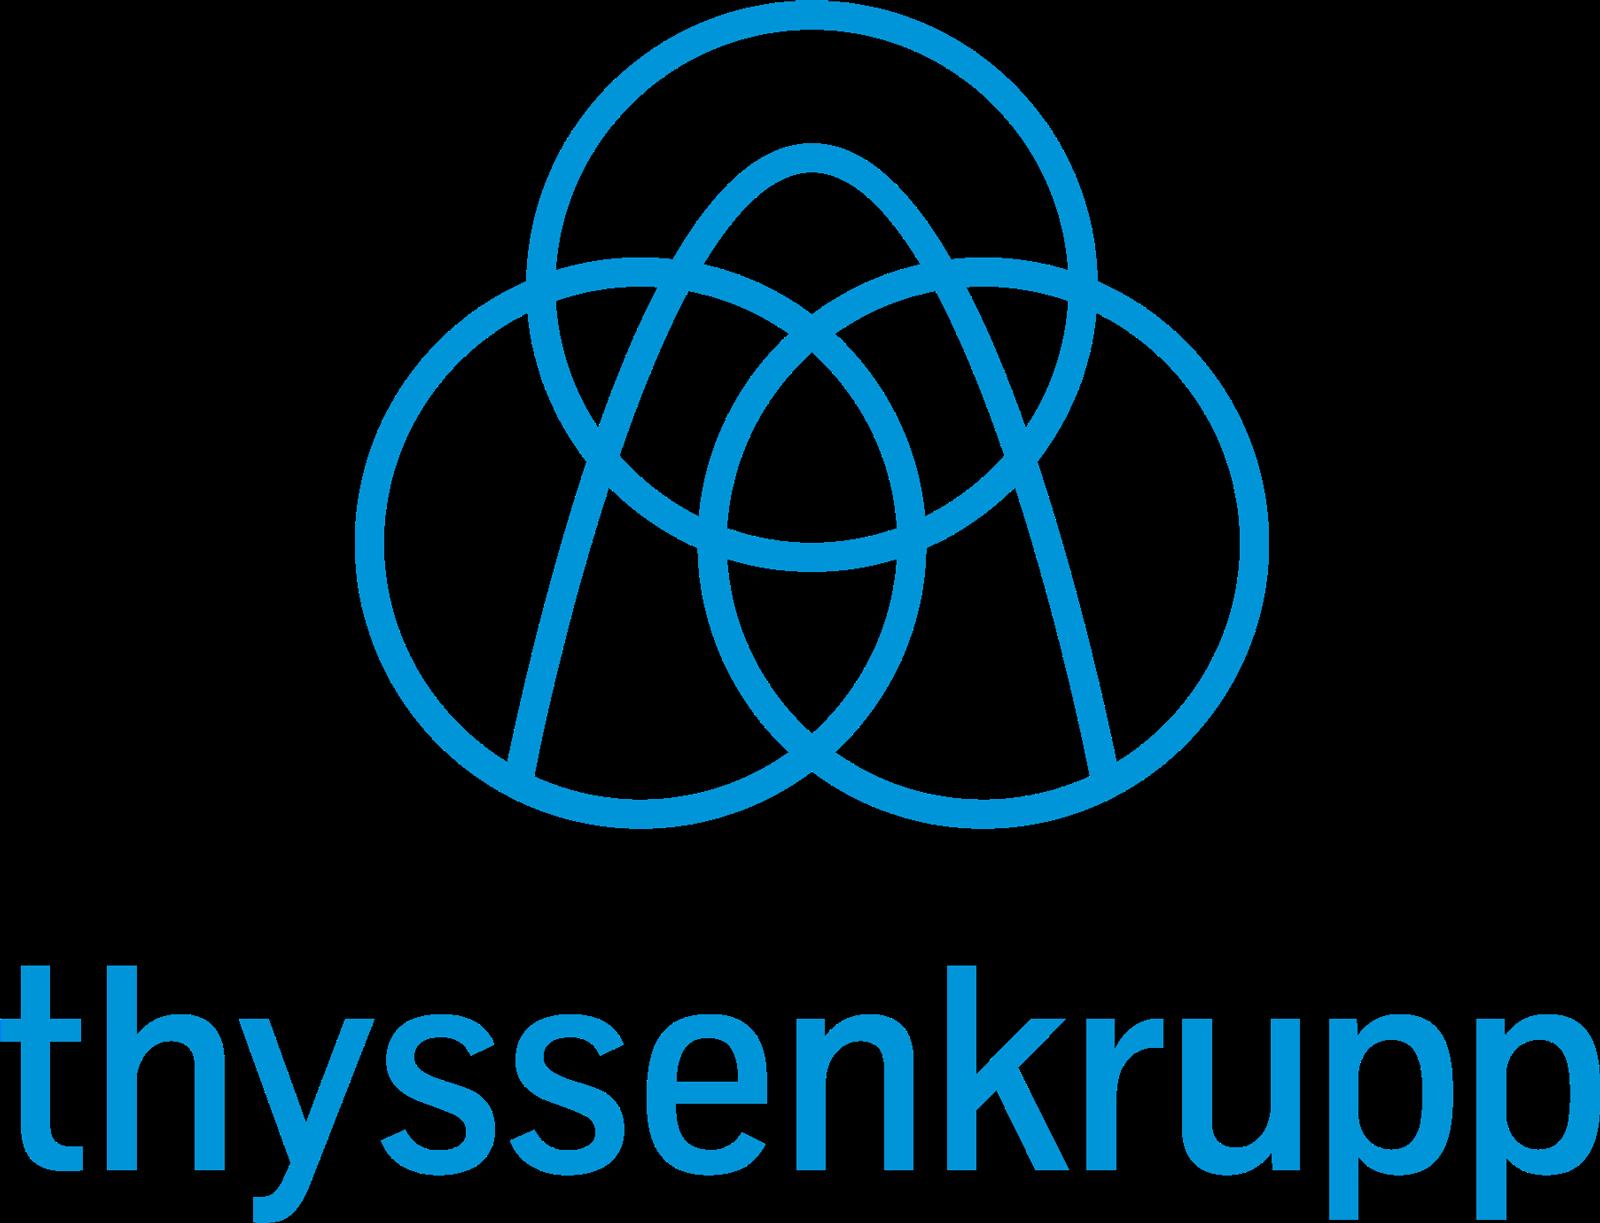 thyssenkrupp System Engineering GmbH